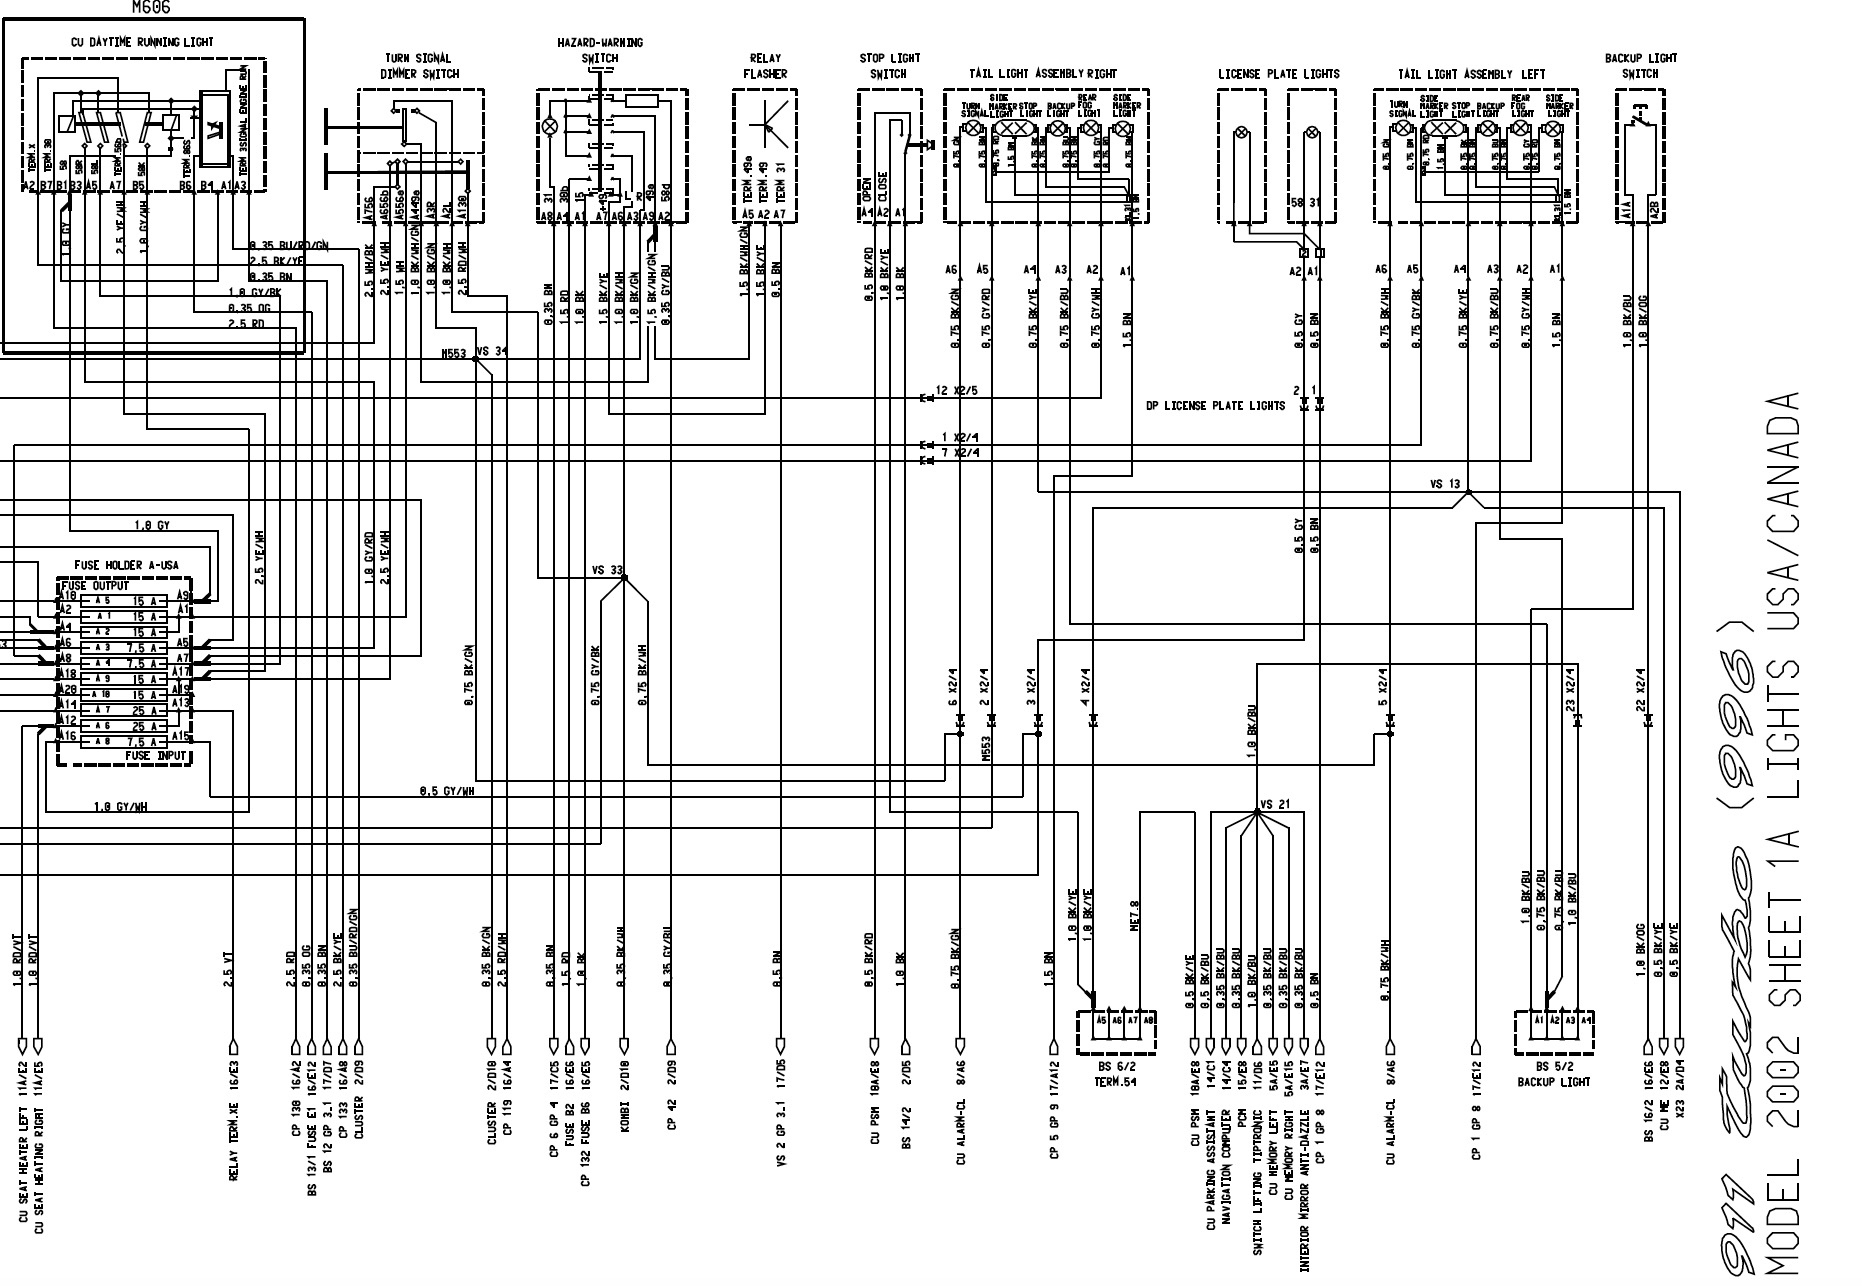 Porsche 996 Wiring Diagram 2001 Data Diagrams Search For U2022 Rh Idijournal Com 911 Turbo Specs 2000 Cabriolet